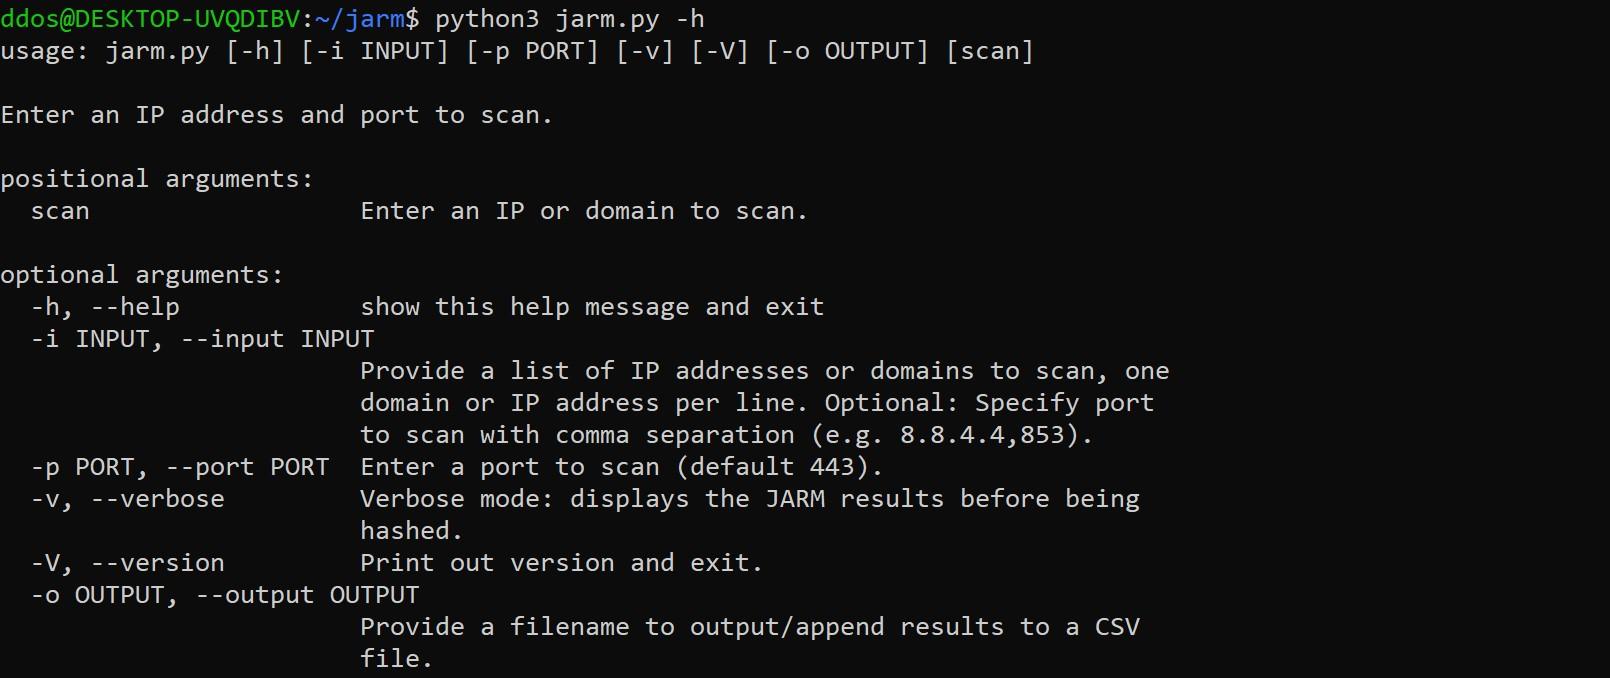 TLS server fingerprinting tool